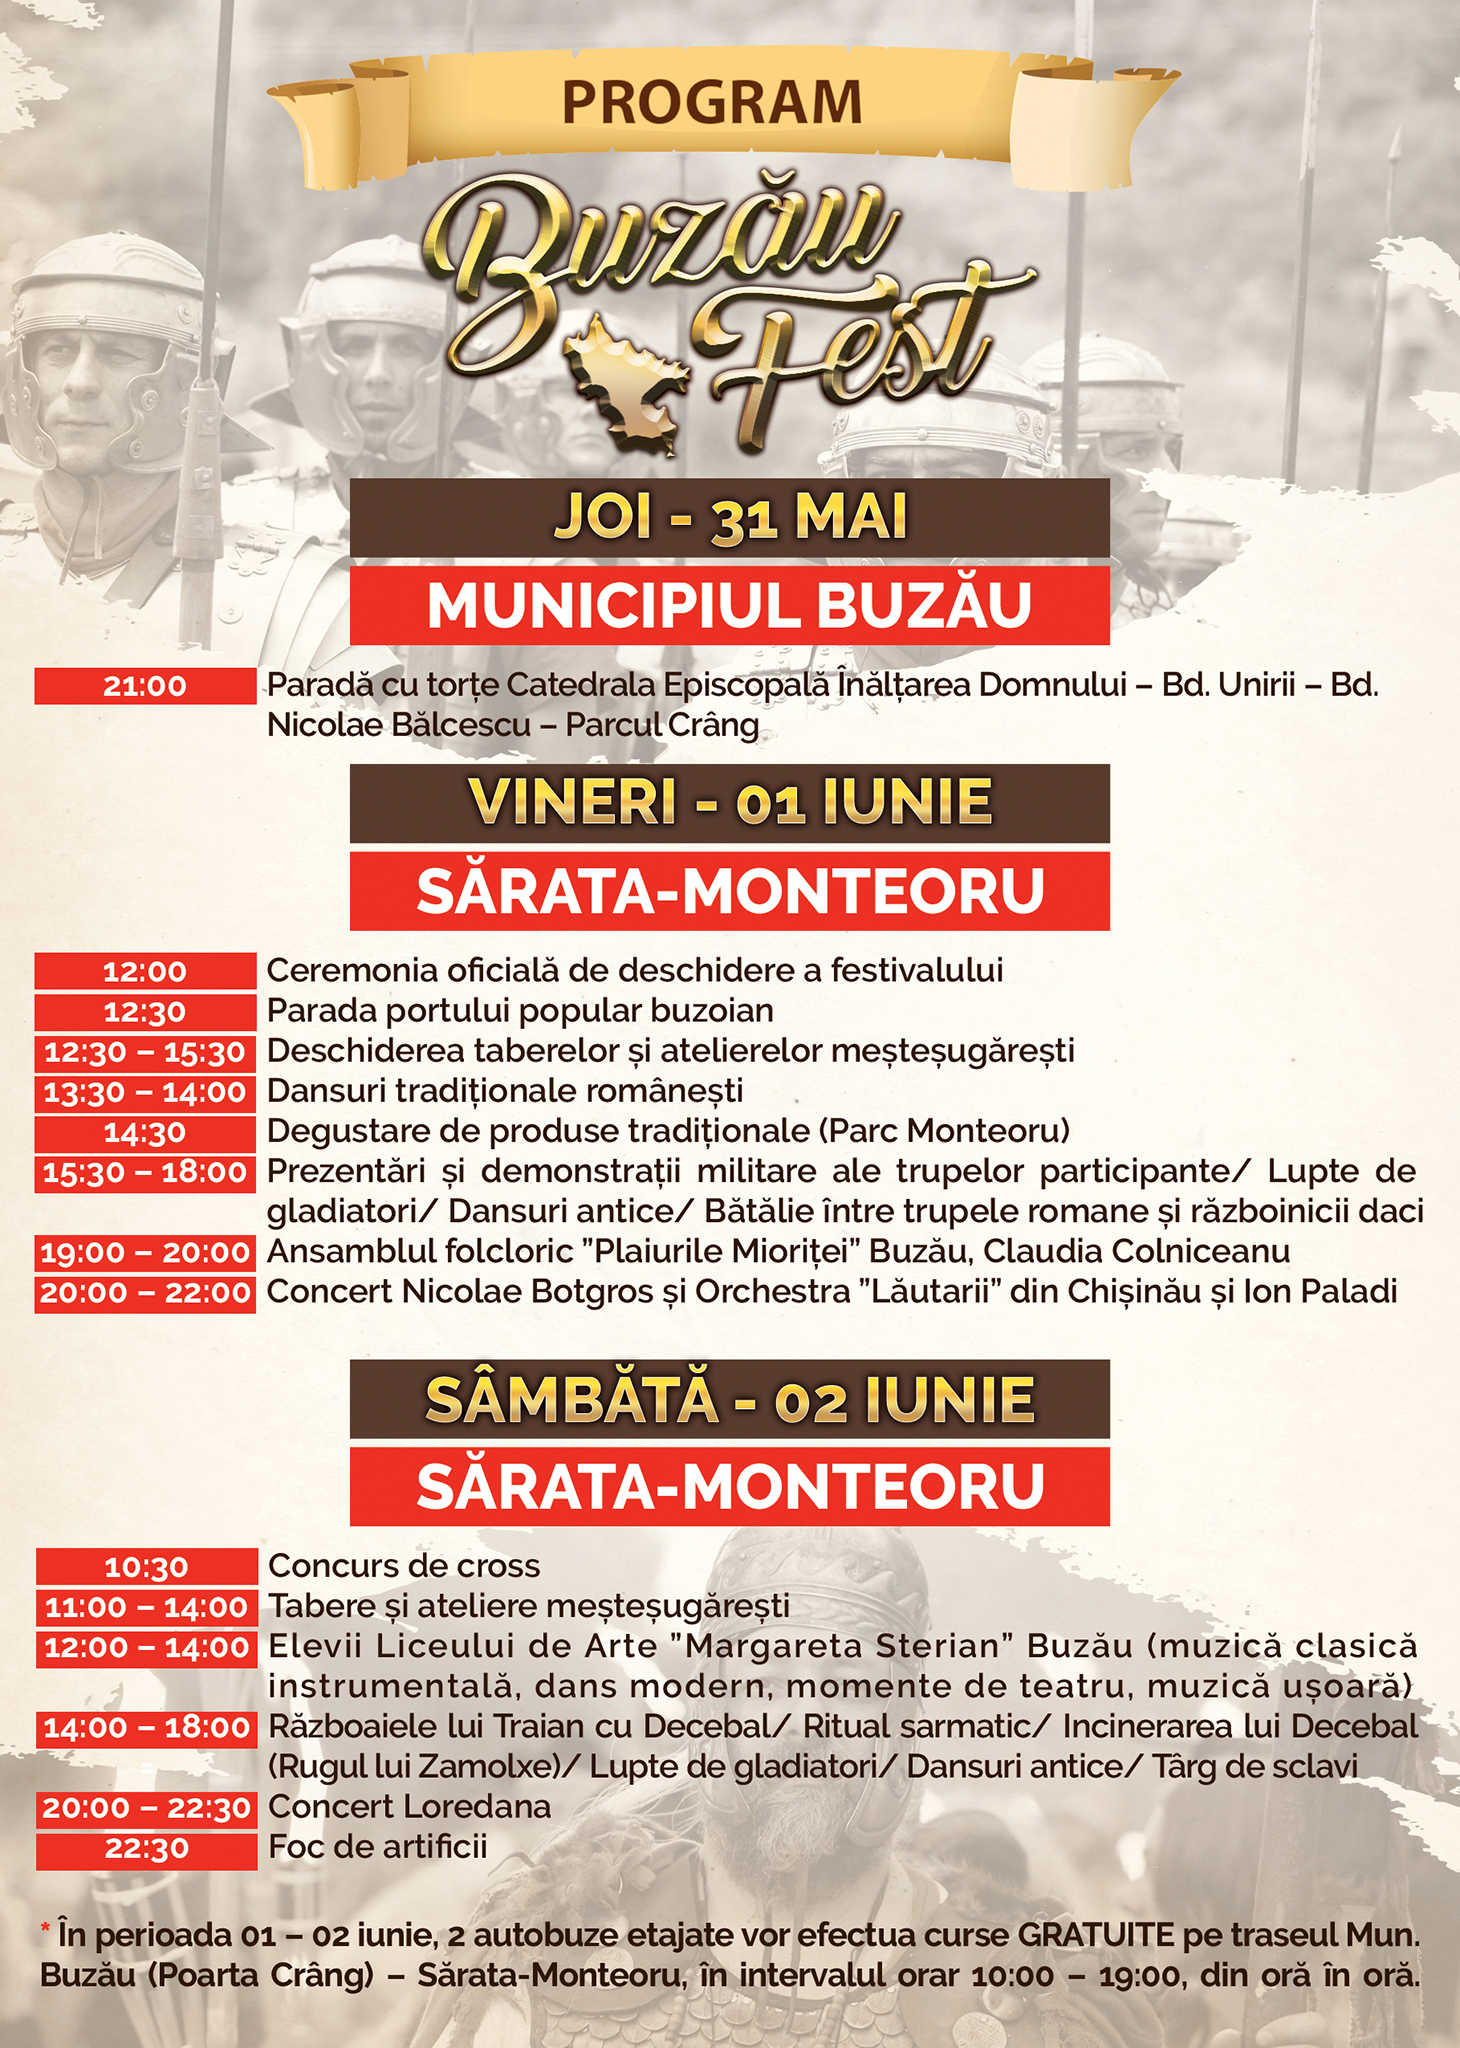 Buzau Fest Flyer Program Online